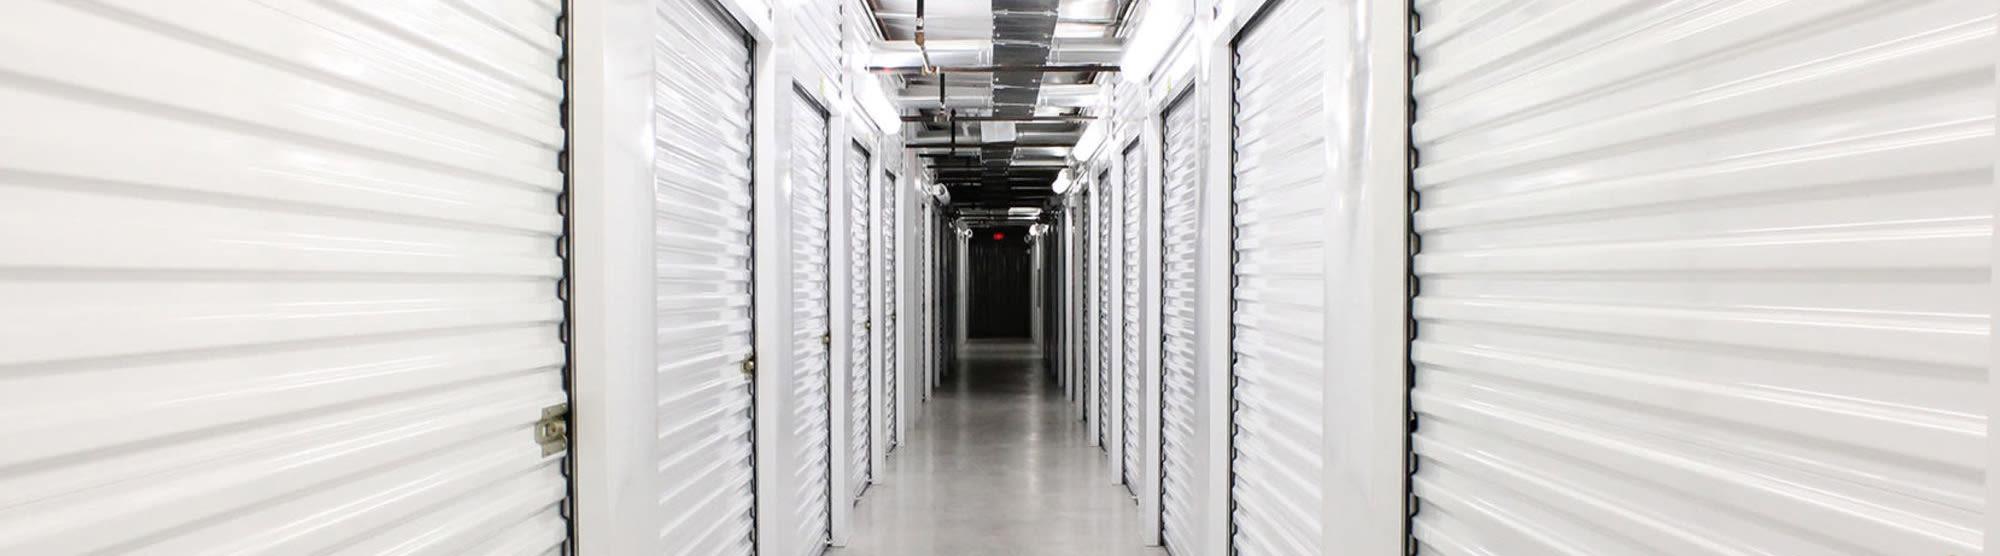 StayLock Storage in Benton Harbor, Michigan